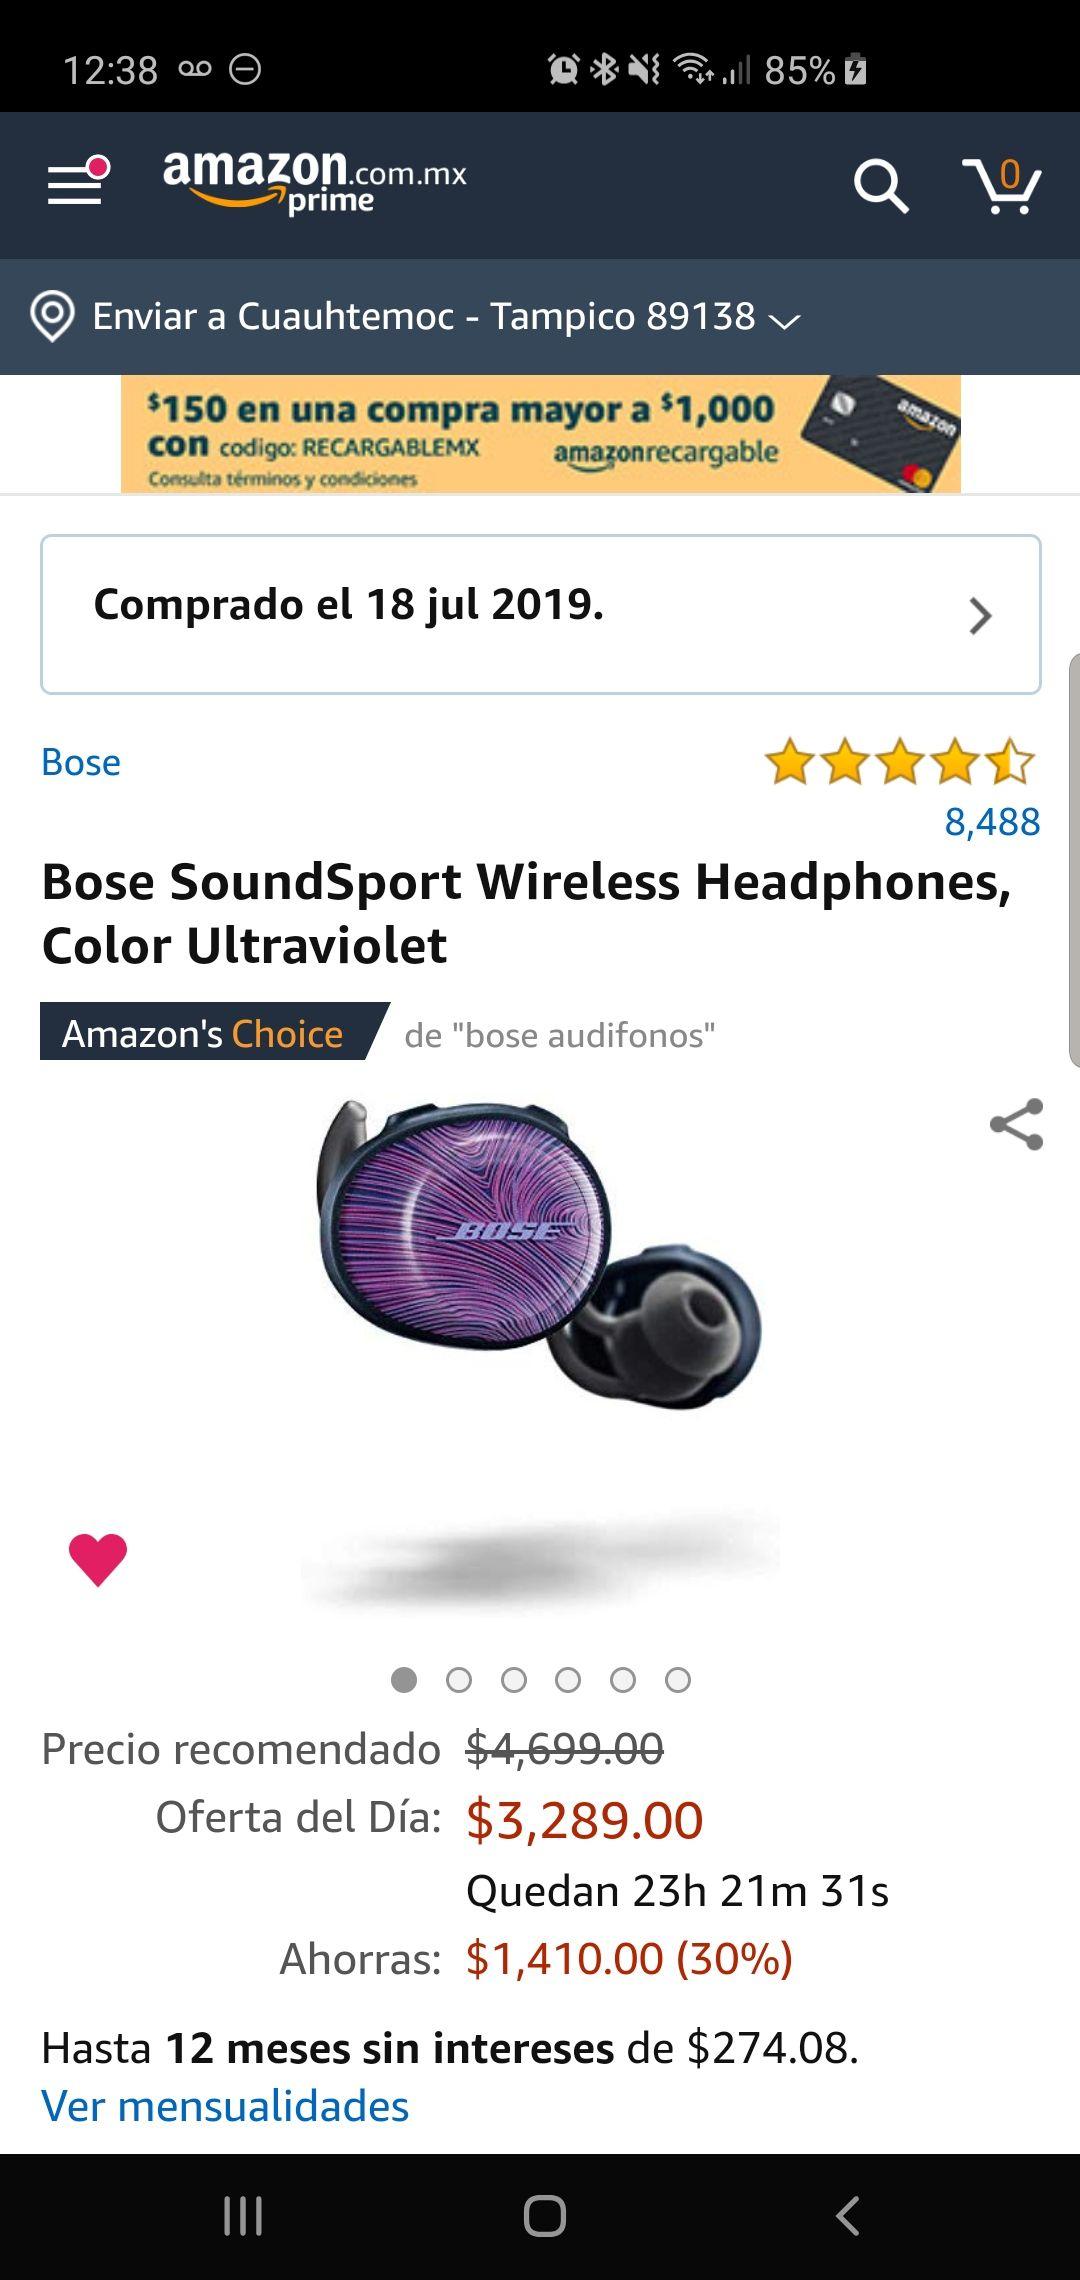 Amazon: Bose SoundSport Wireless Headphones, Color Ultraviolet